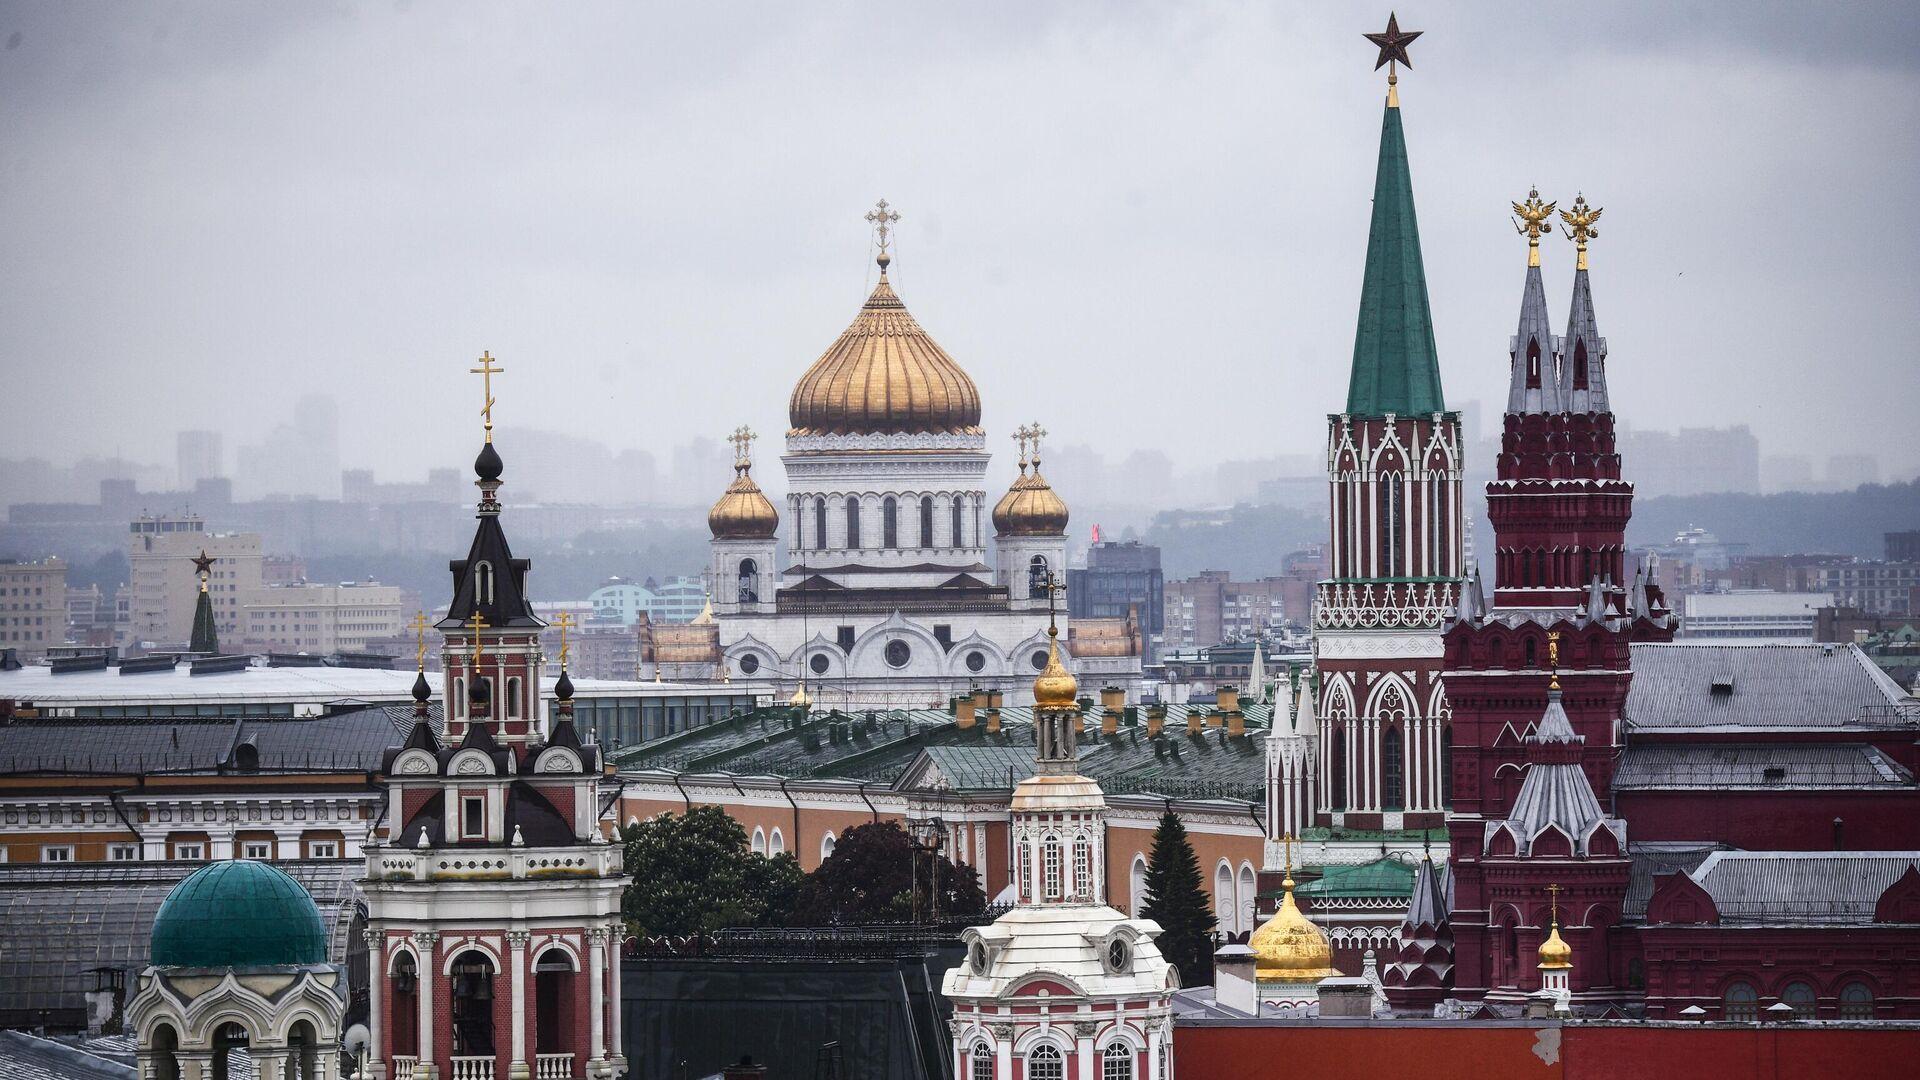 Храм Христа Спасителя в Москве - РИА Новости, 1920, 07.05.2021